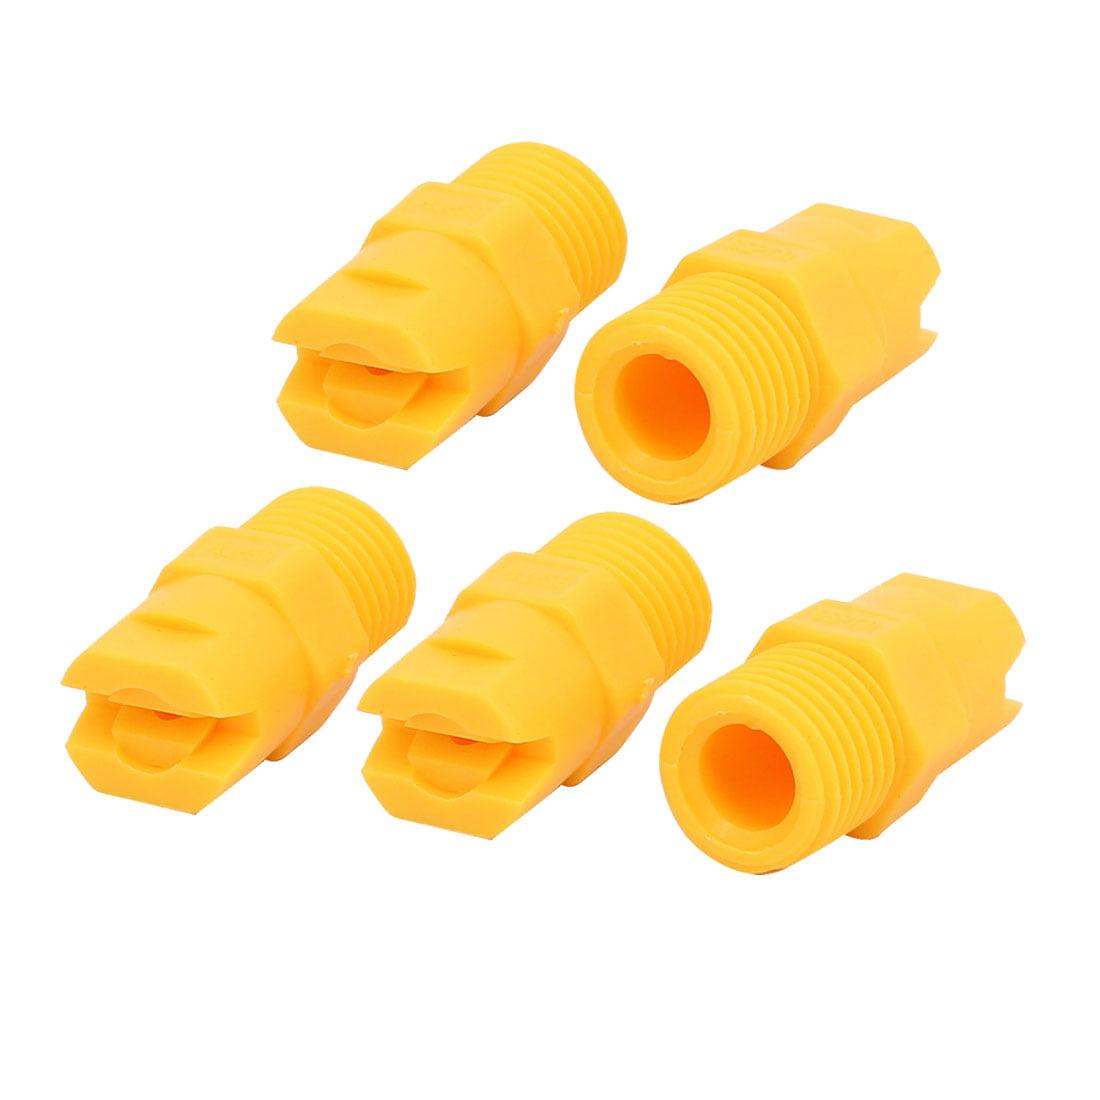 1/4PT Male Thread 80 Degree PP Standard Veejet Flat Fan Spray Tip Yellow 5pcs